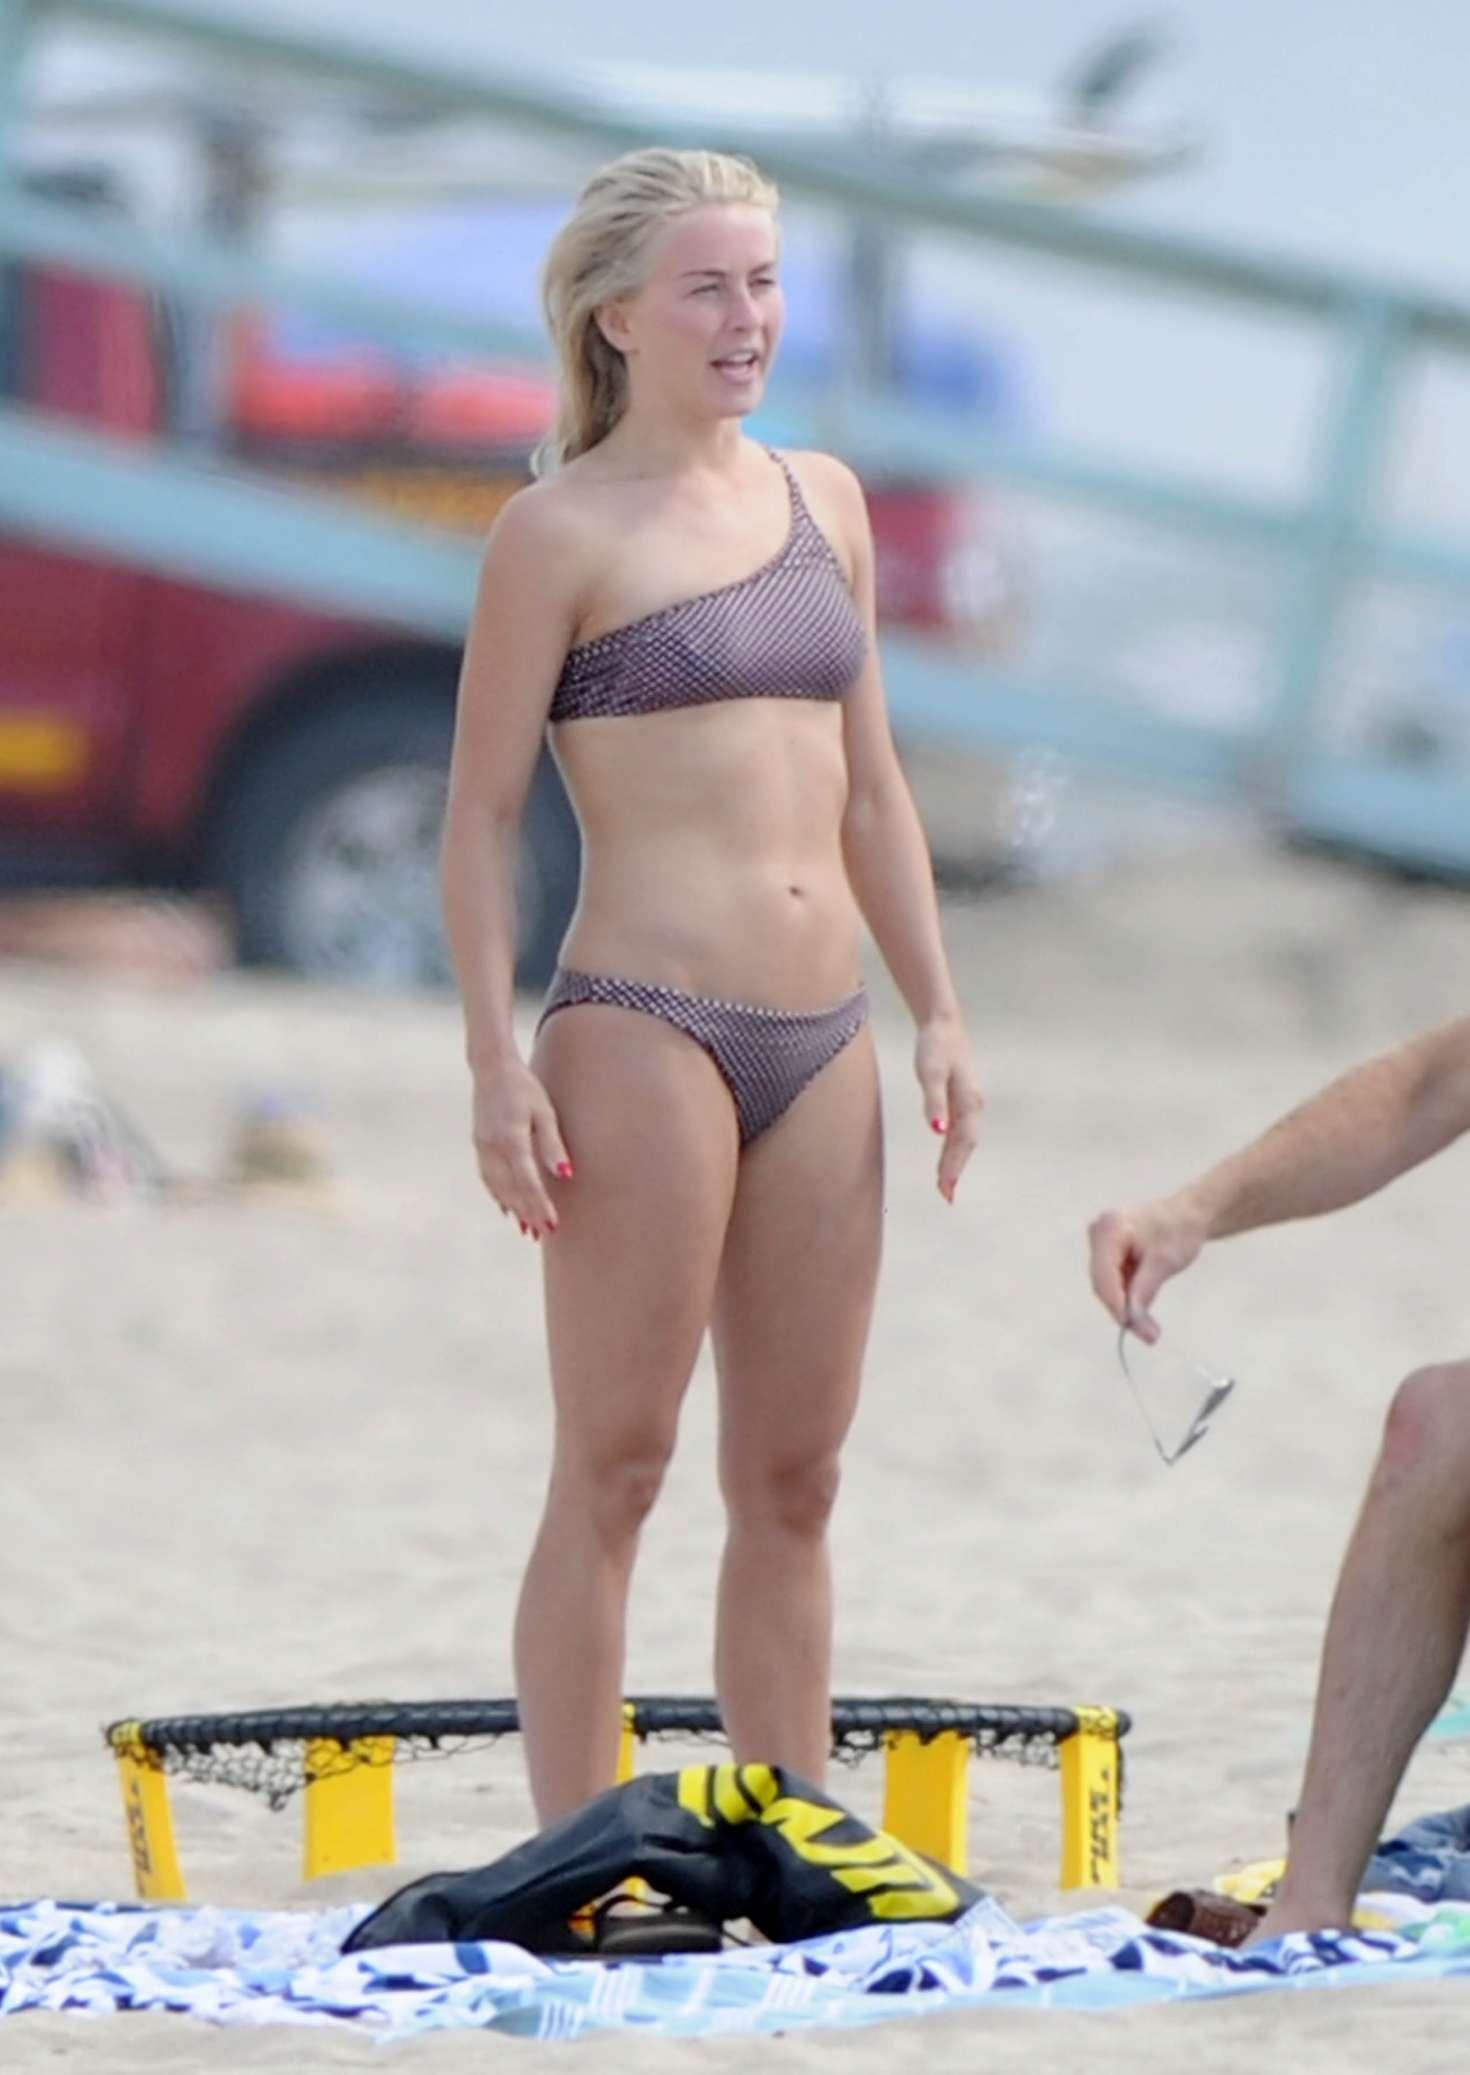 Julianne Hough 2017 : Julianne Hough: Bikini with husband Brooks Laich at the beach in Manhattan Beach-16